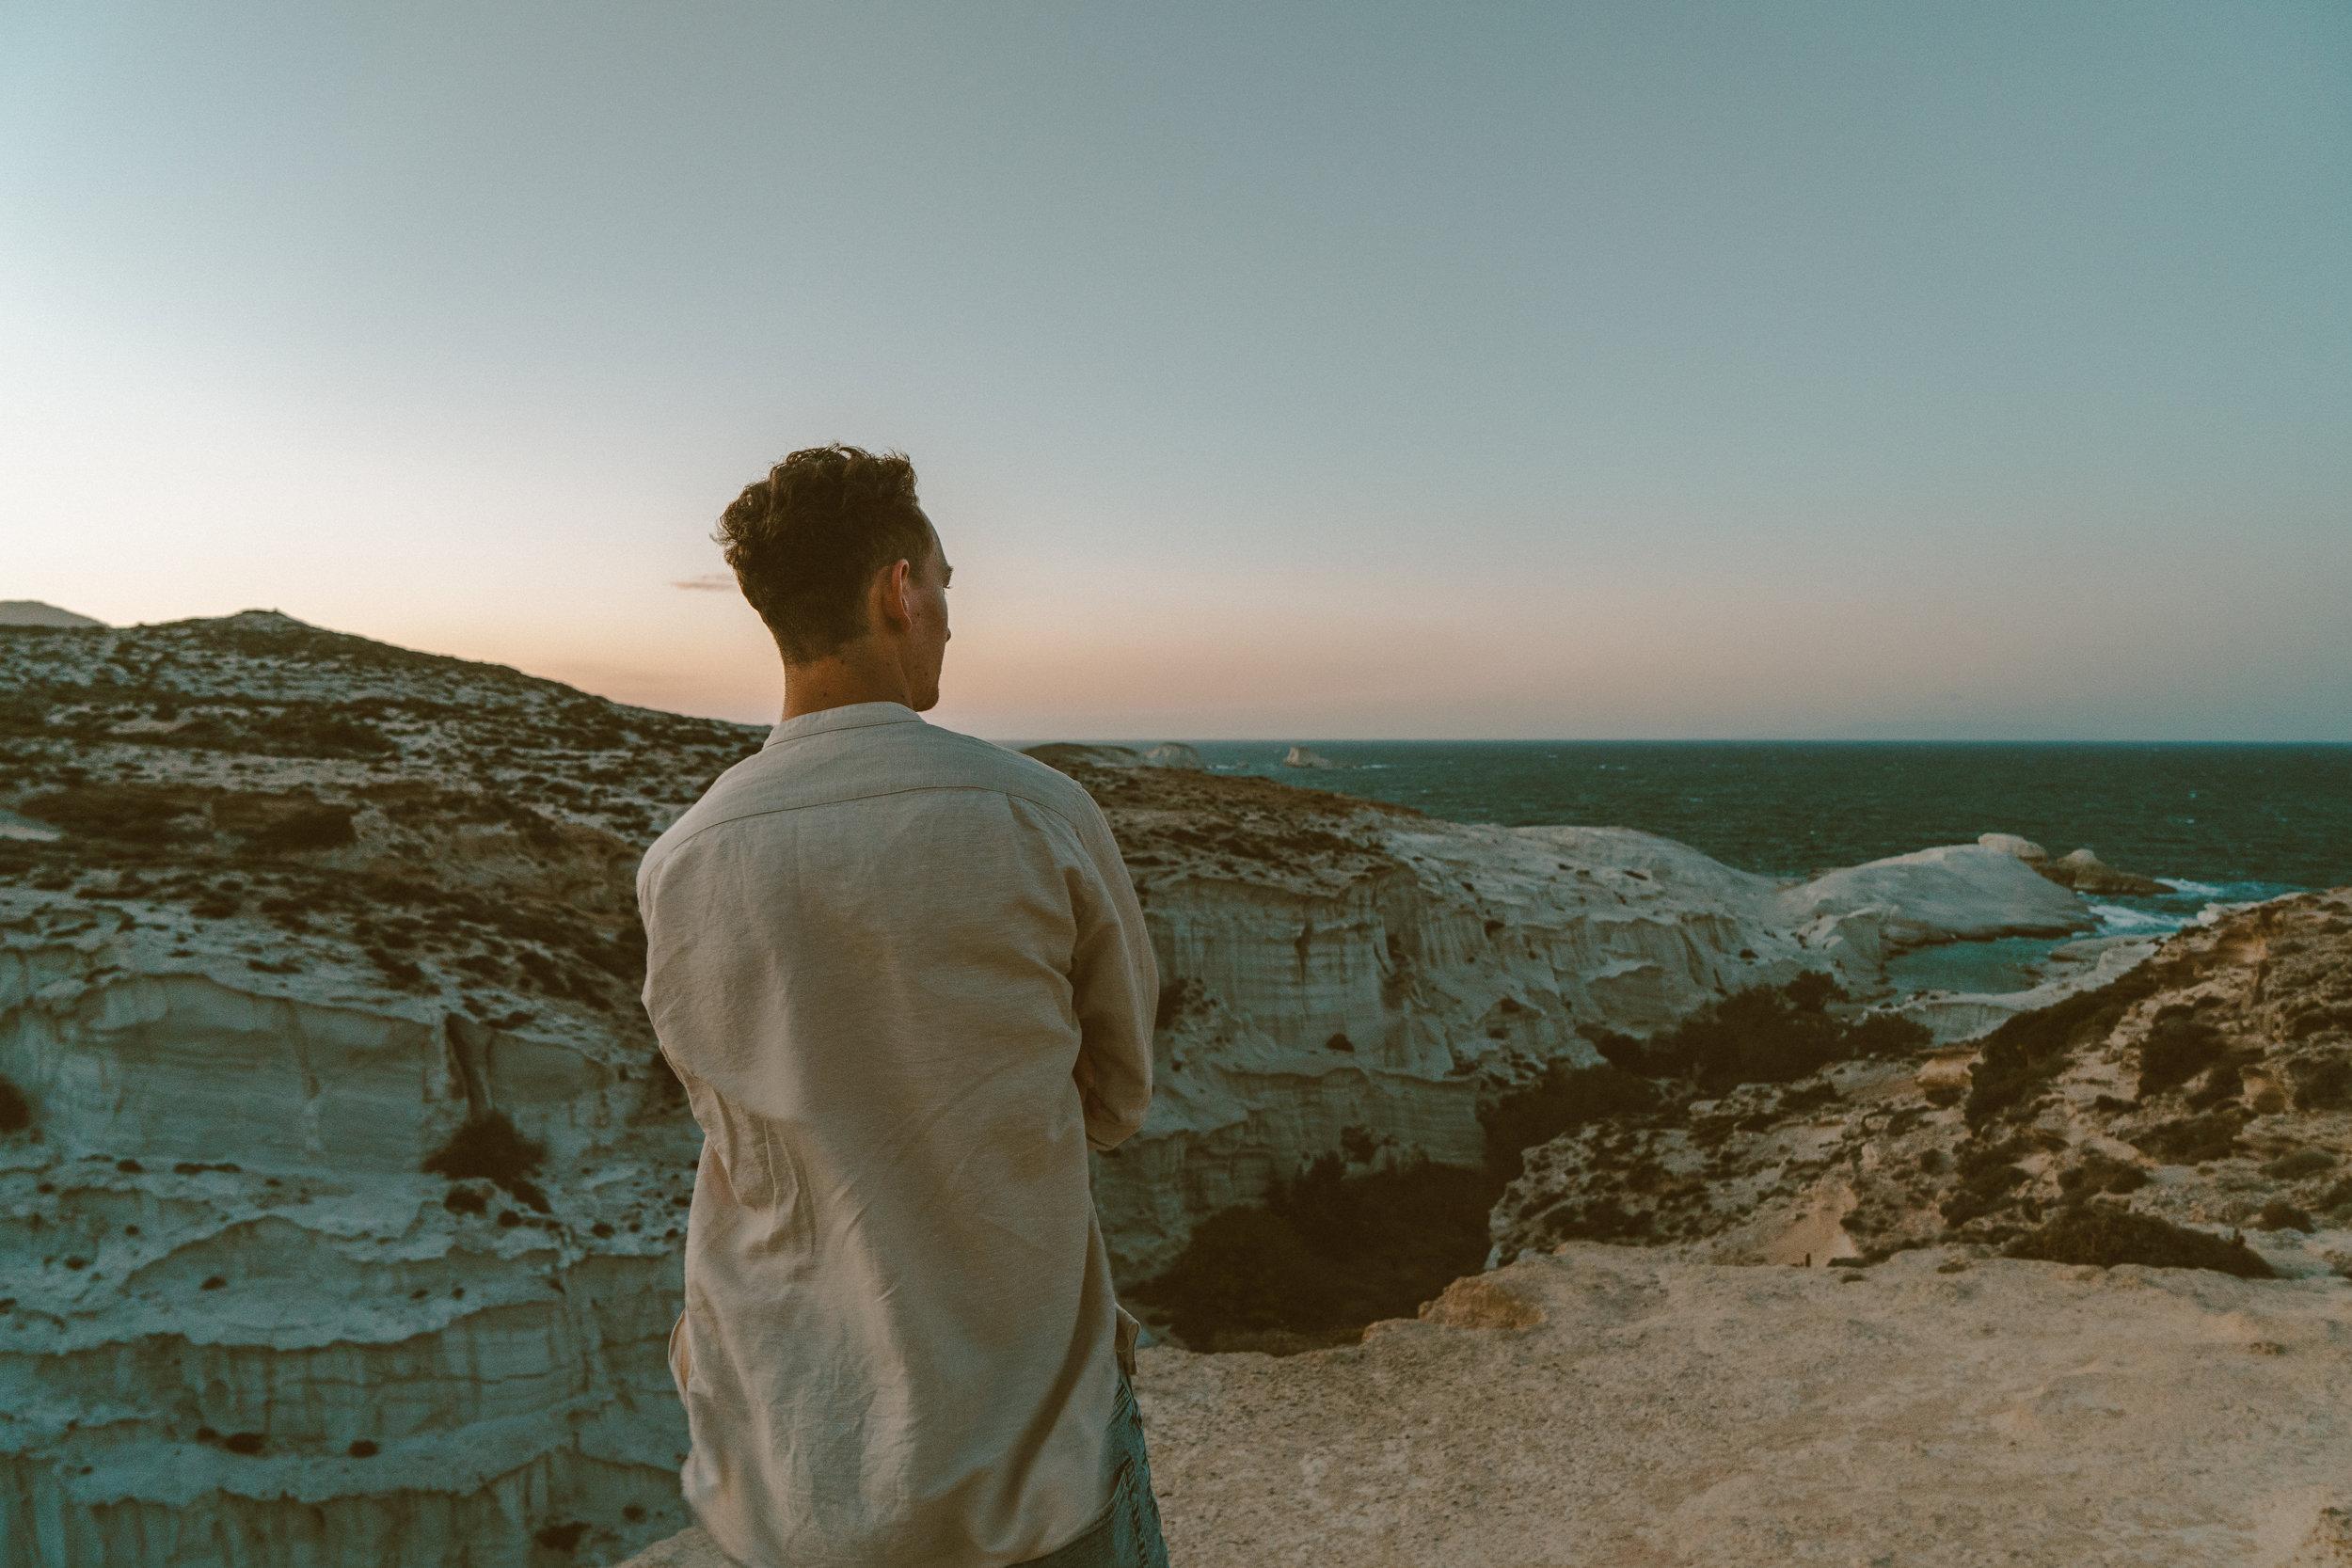 Harry man standing facing the ocean on Sarakiniko Beach in Milos, Greece, at sunset